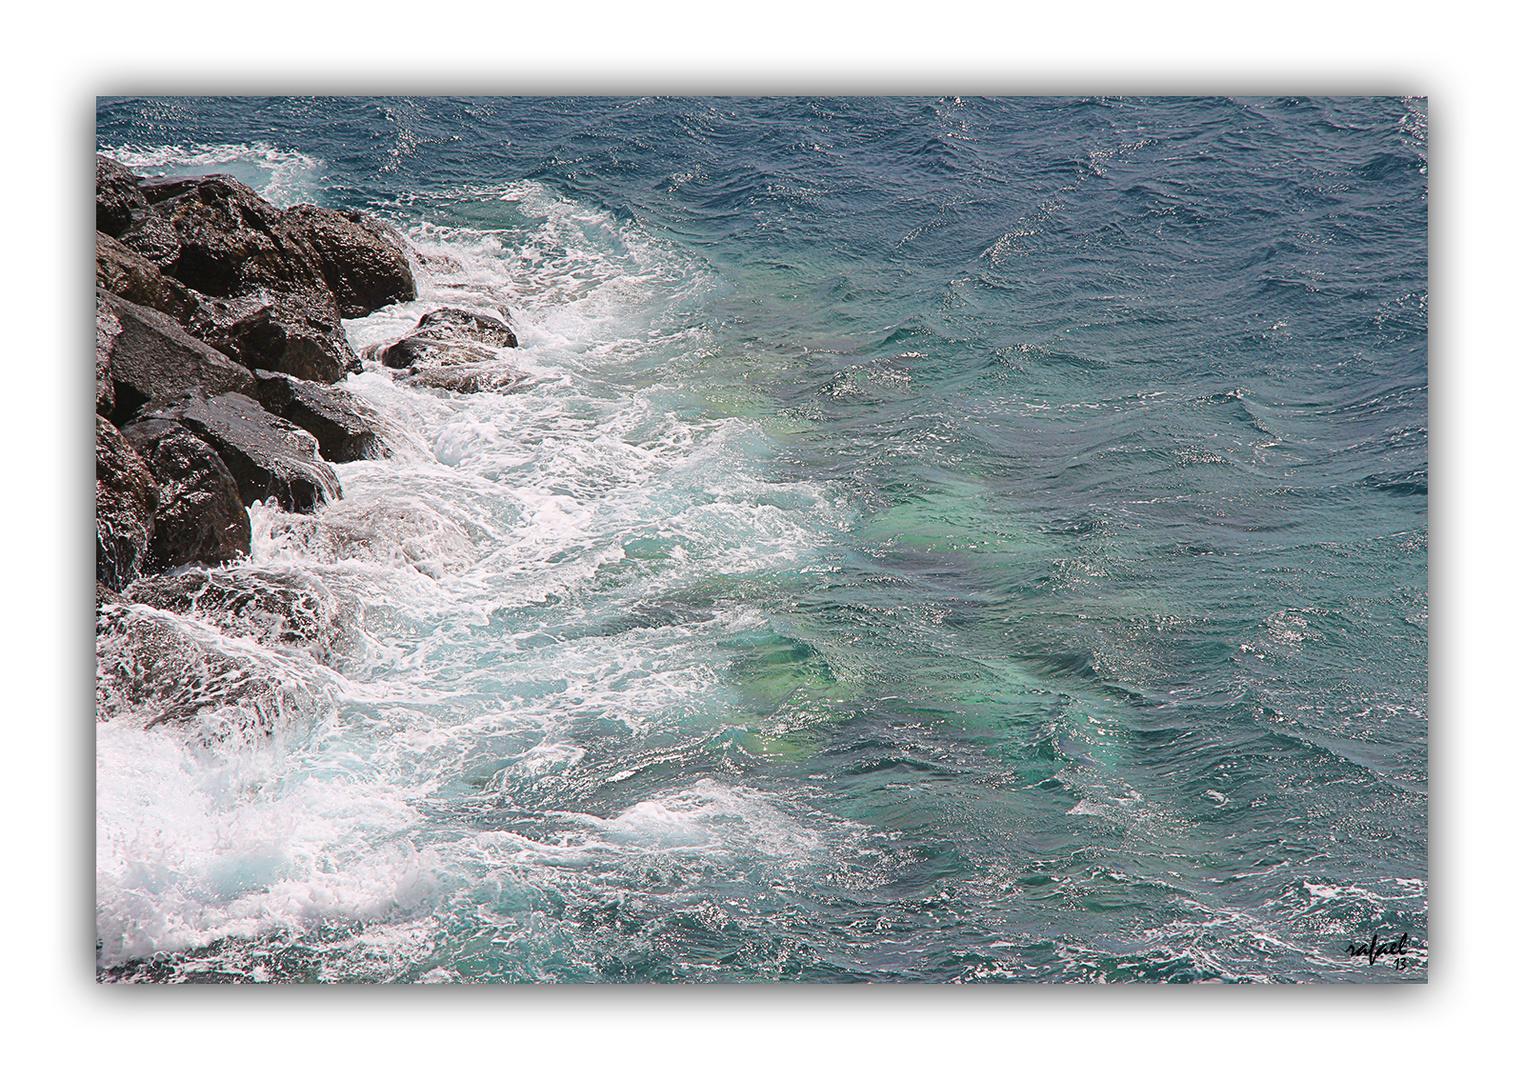 Mar rizada